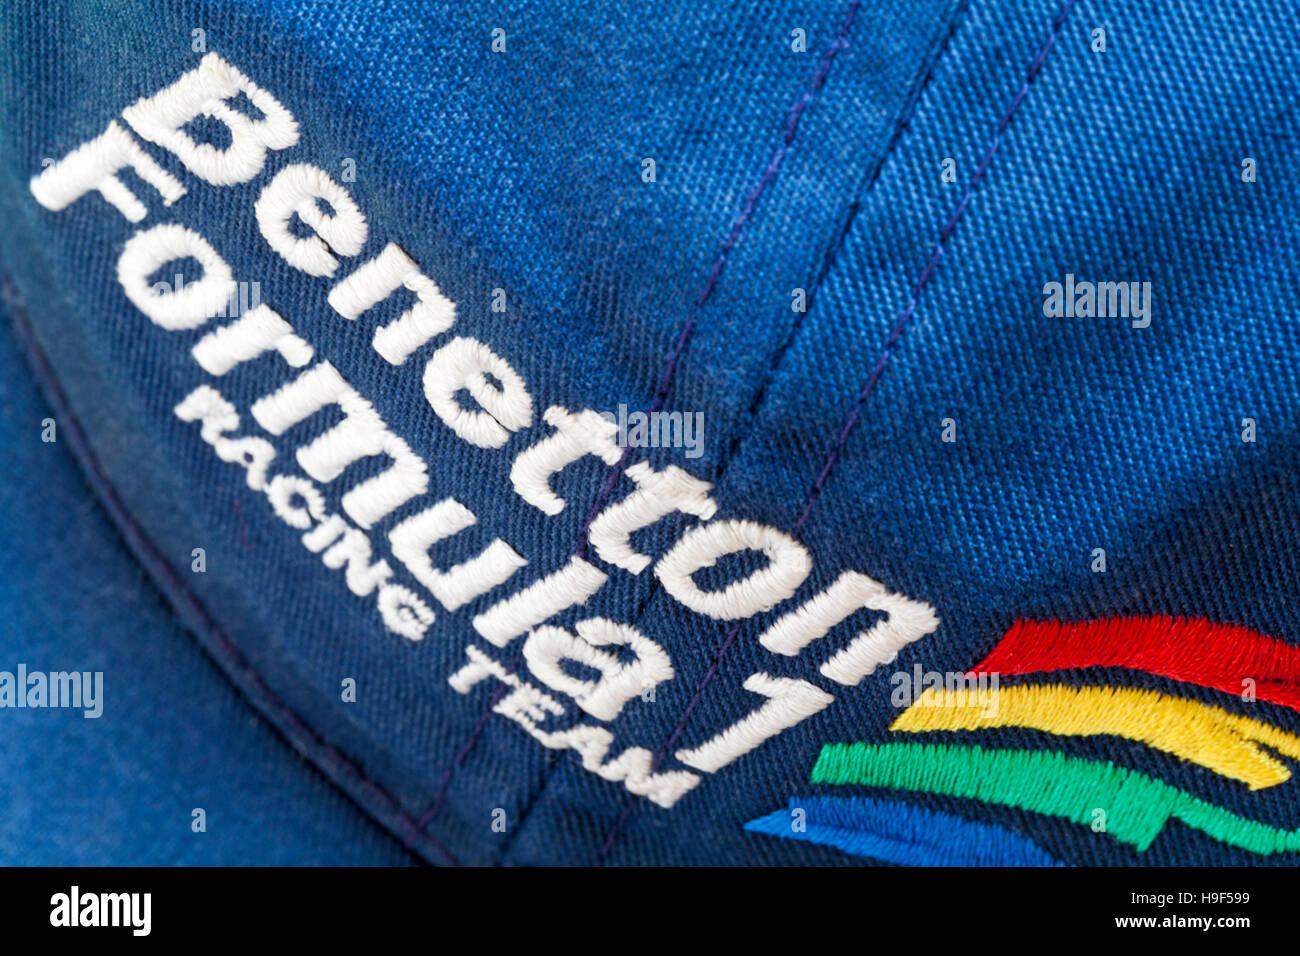 Benetton Formula 1 racing team detail on baseball cap - Stock Image